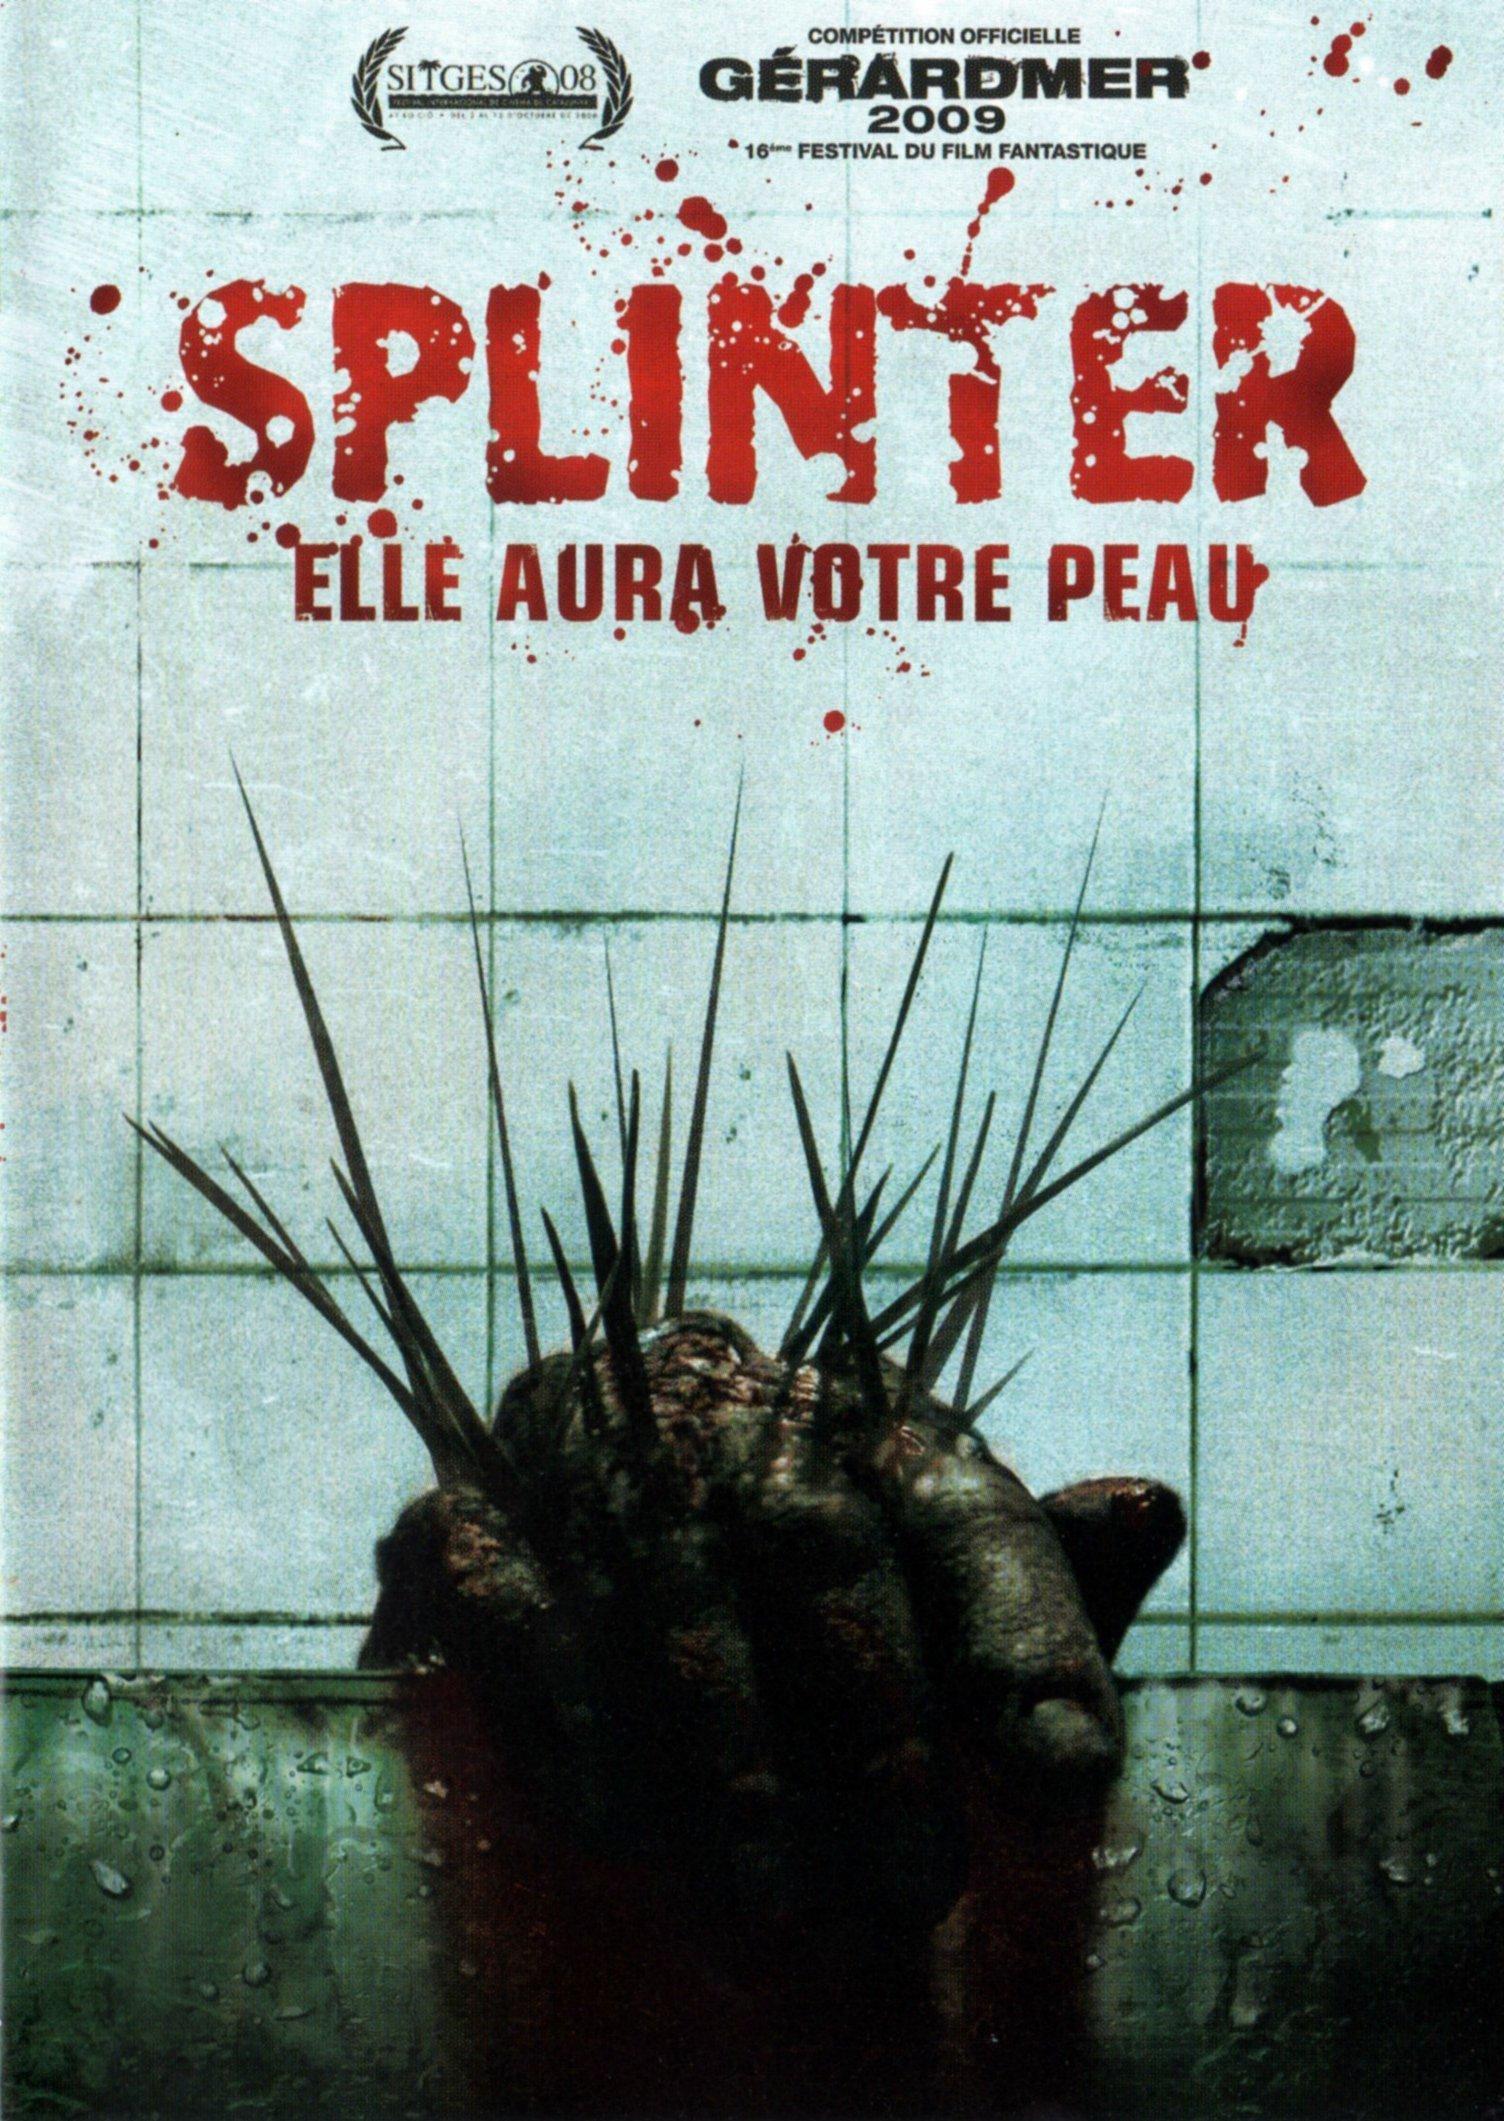 Films d'Horreur Gore Fantastique FR Ou VO !!!!!!! - Portail 9WOrptMZDlkdLWqrDUhWwjLyvvc